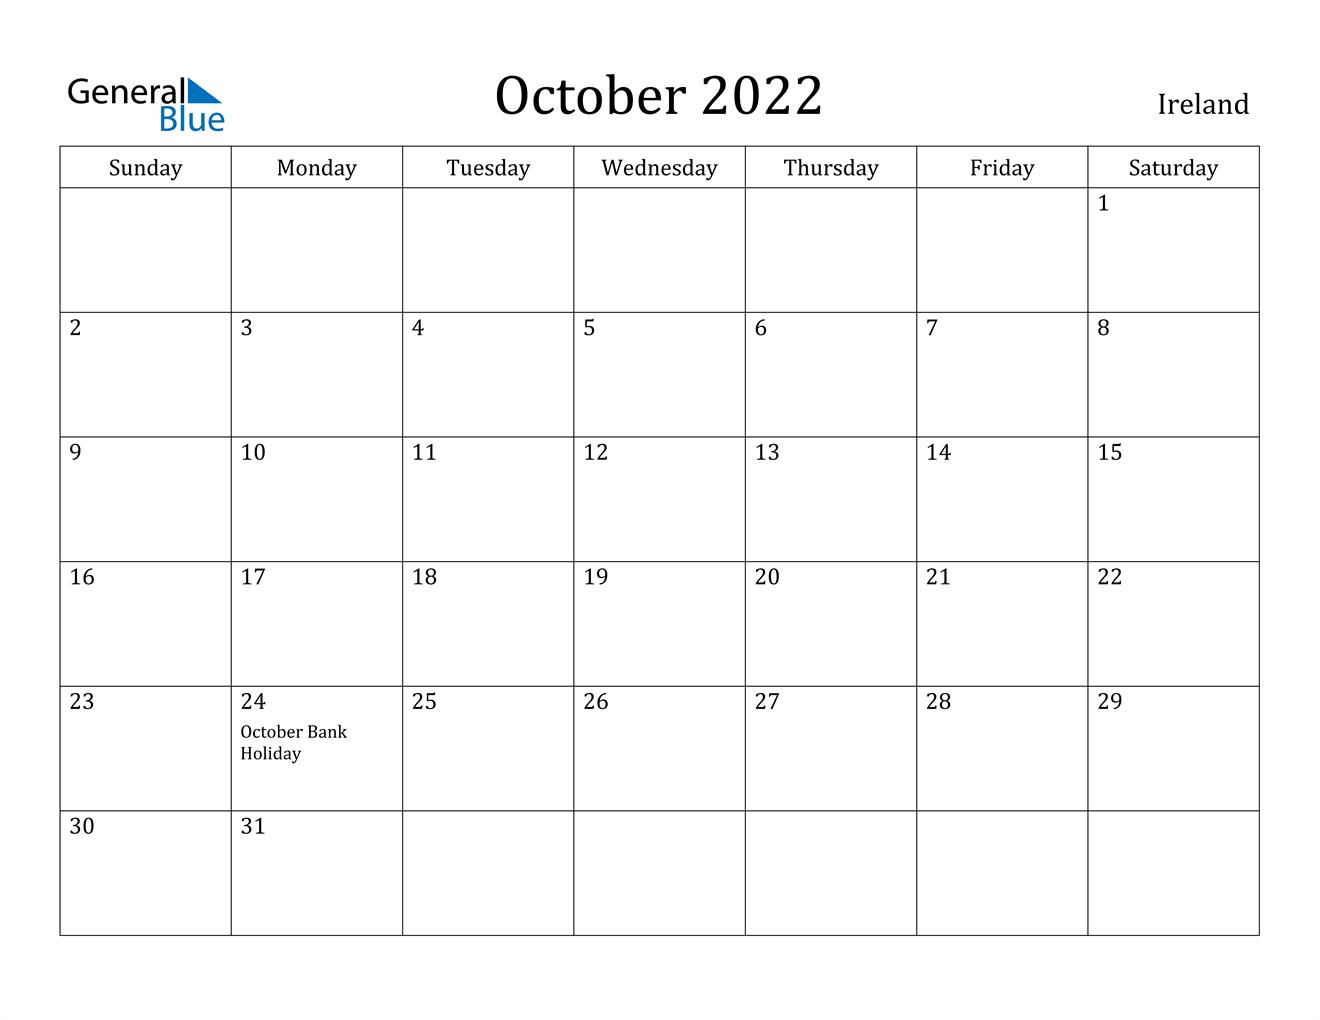 October 2022 Calendar With Holidays.Ireland October 2022 Calendar With Holidays